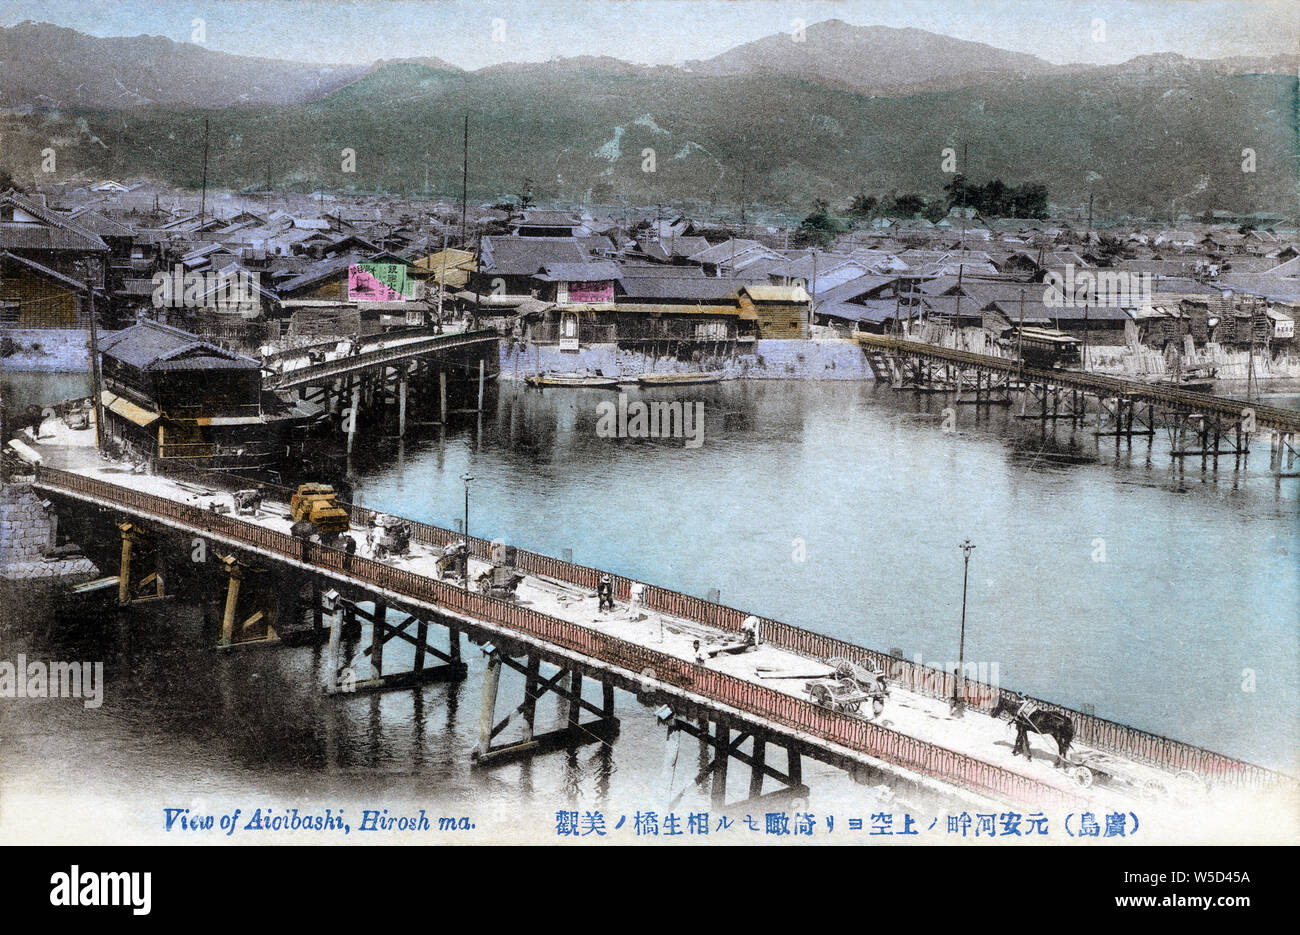 1900s Japan Aioibashi Bridge Hiroshima Aioibashi Bridge 相生